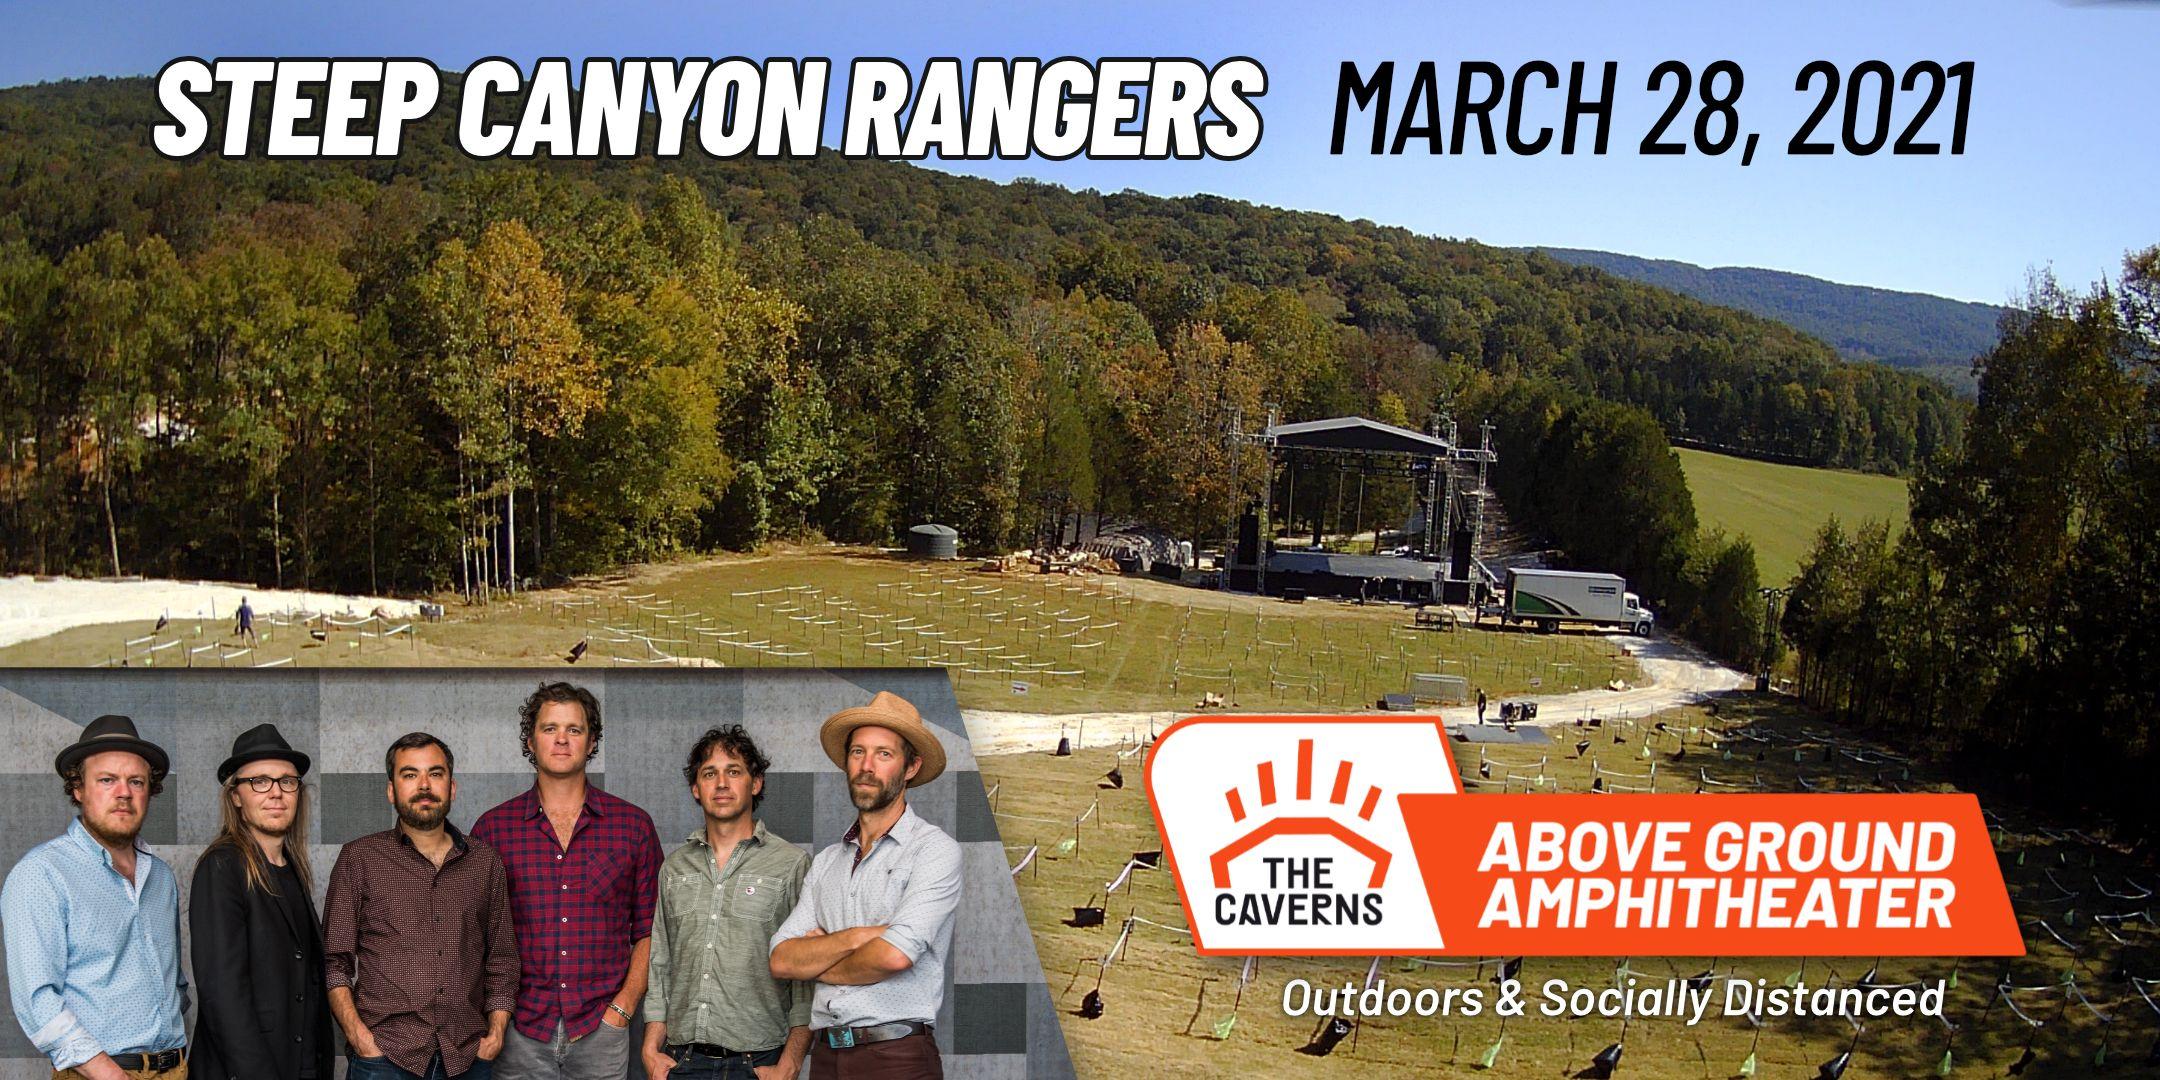 CVRNS Steep Canyon Rangers 2160x1080.jpg